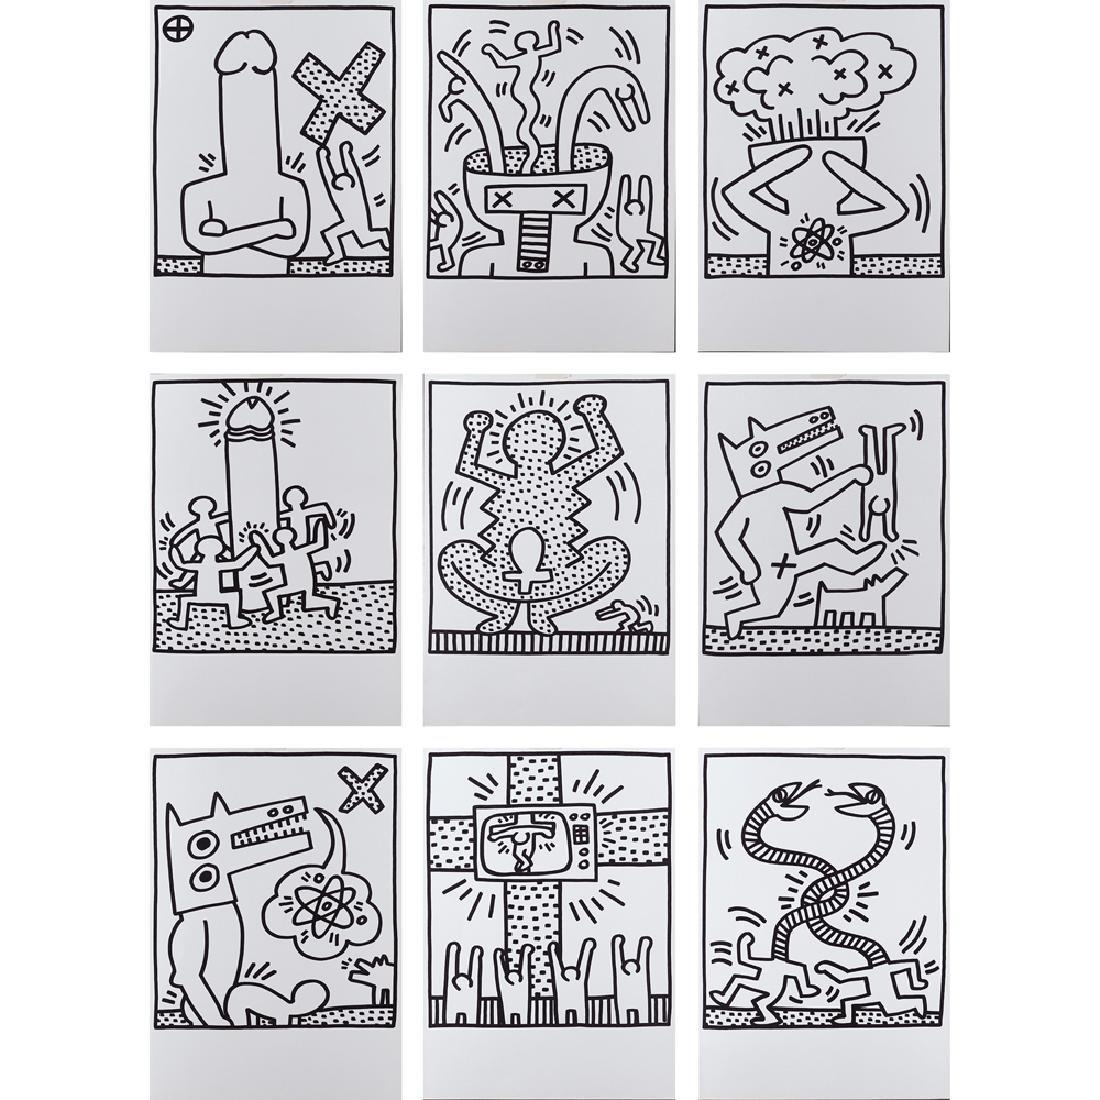 Keith Haring Reading 1958 - New York 1990 47.3x33.5 cm.